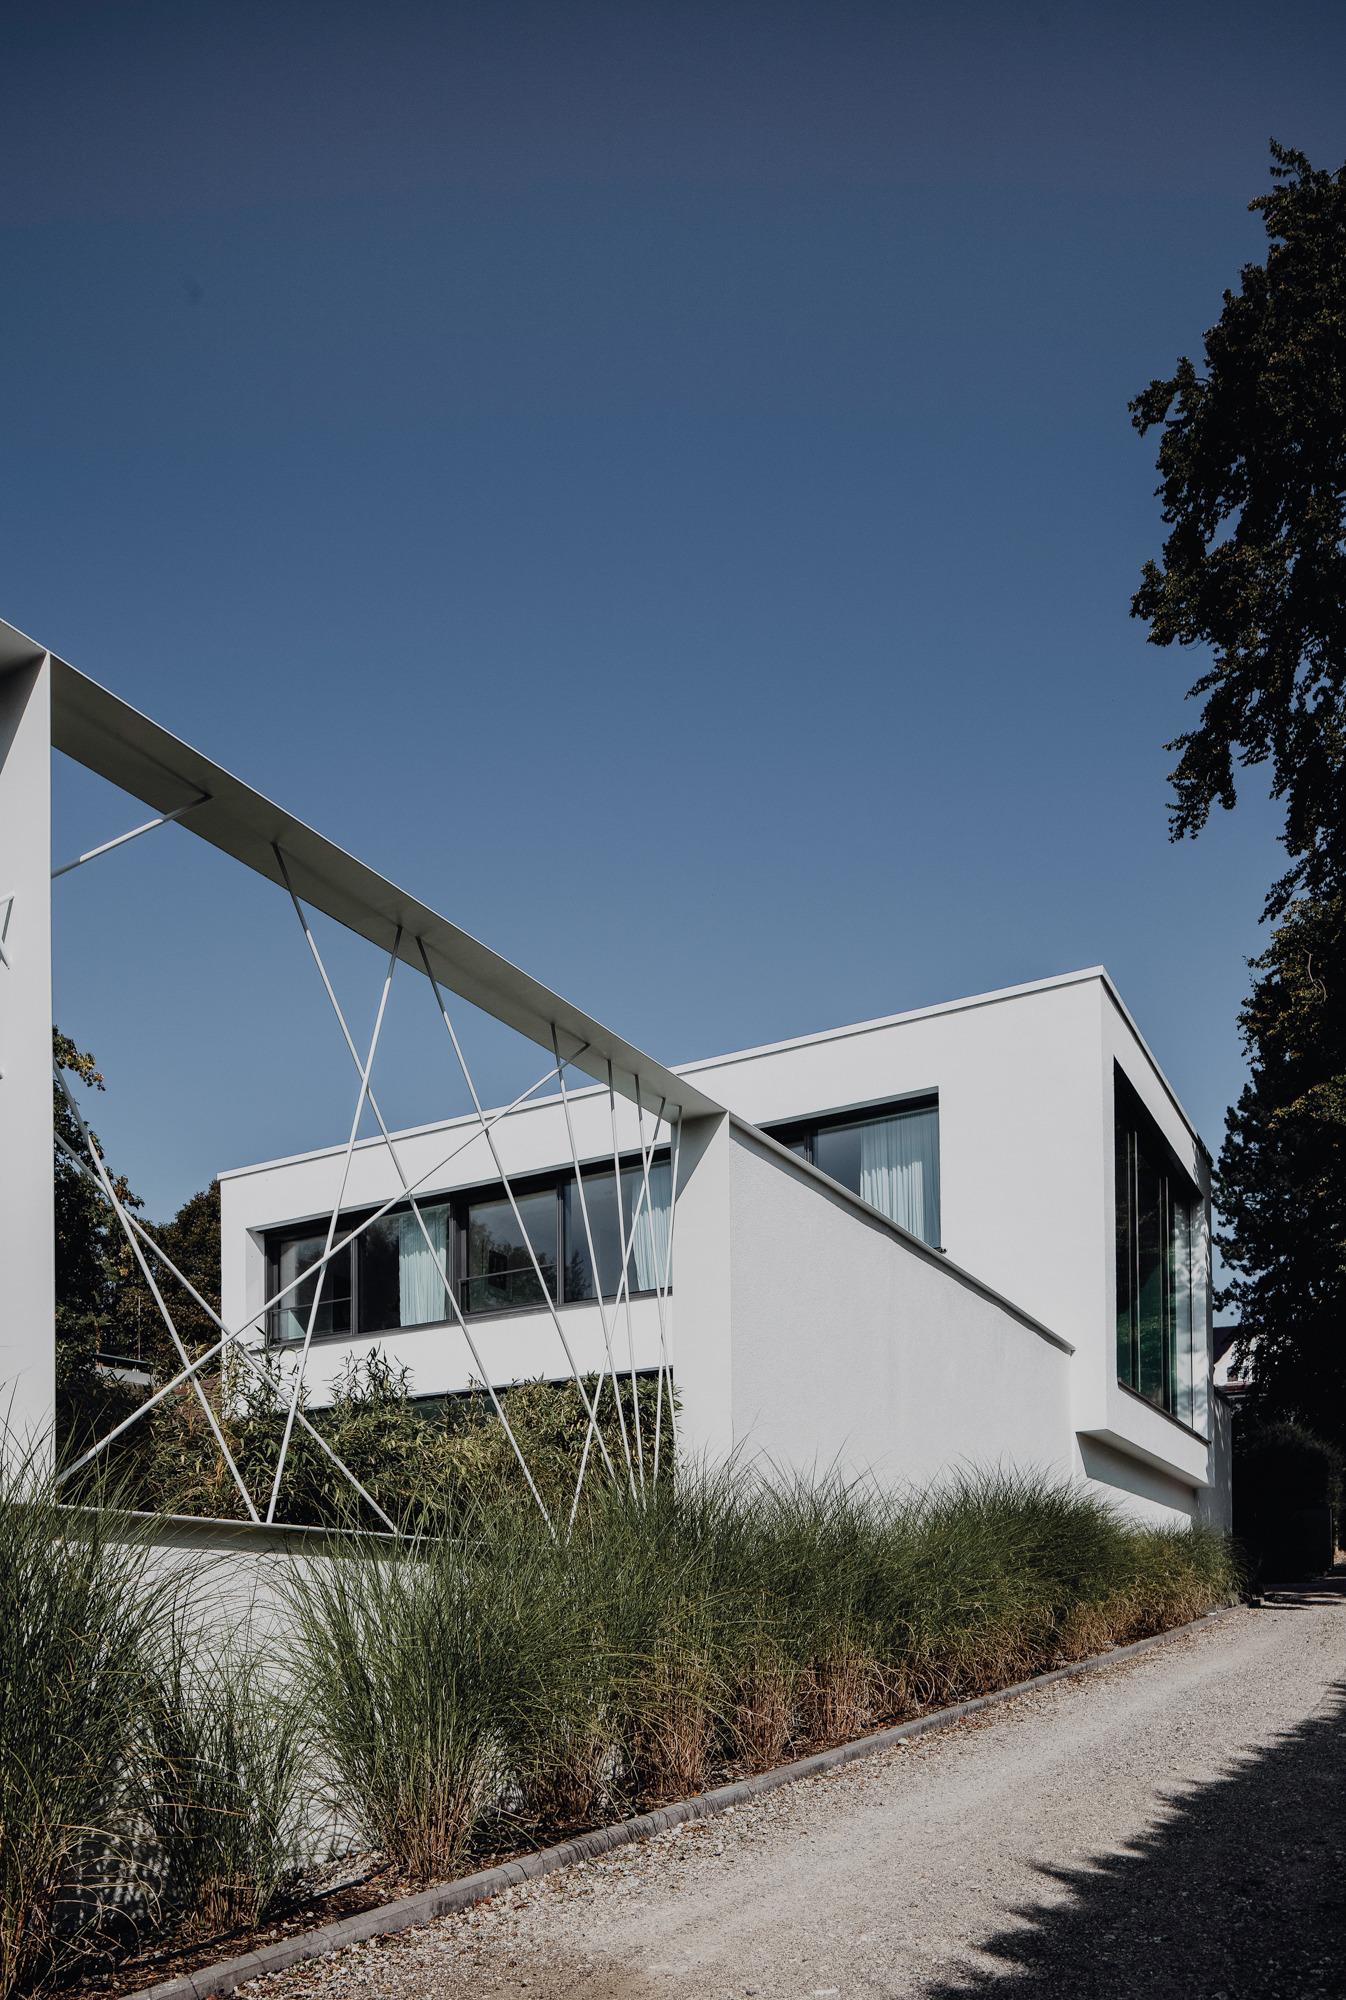 Villa von Osee in Starnberg, Germany by Anna Philipp